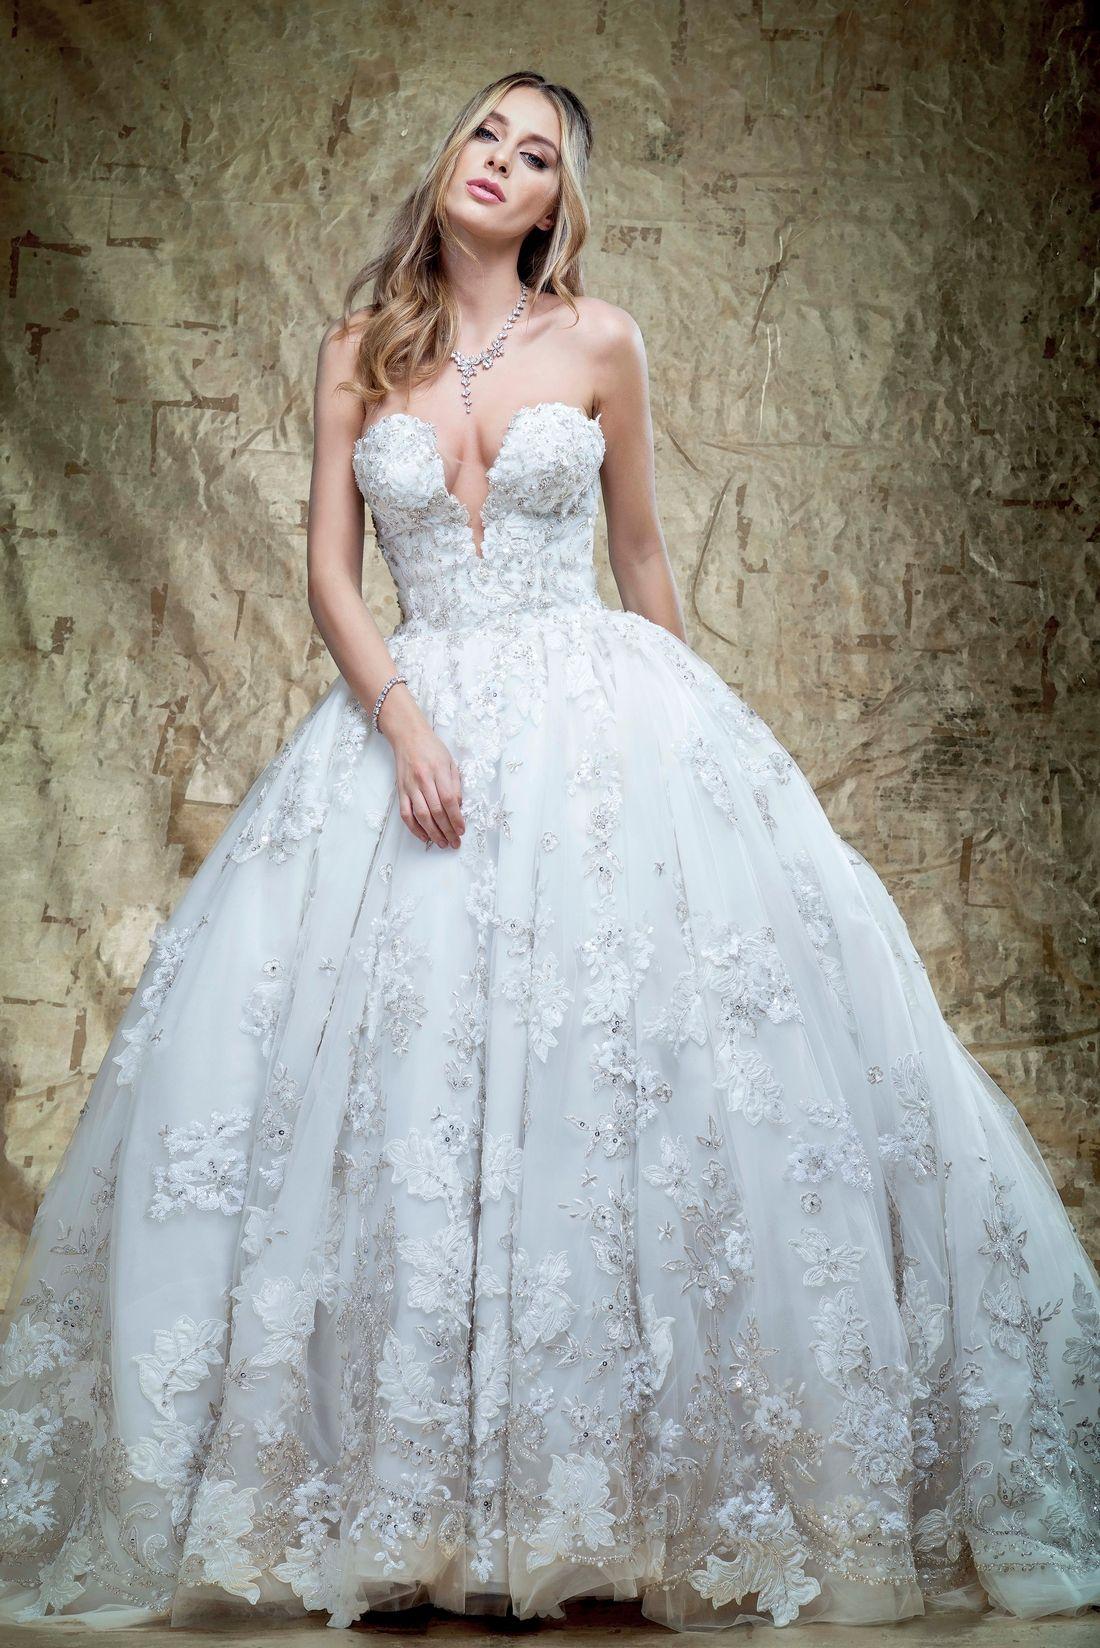 KleinfeldBridal YSA Makino Bridal Gown 33320037 Princess Ball